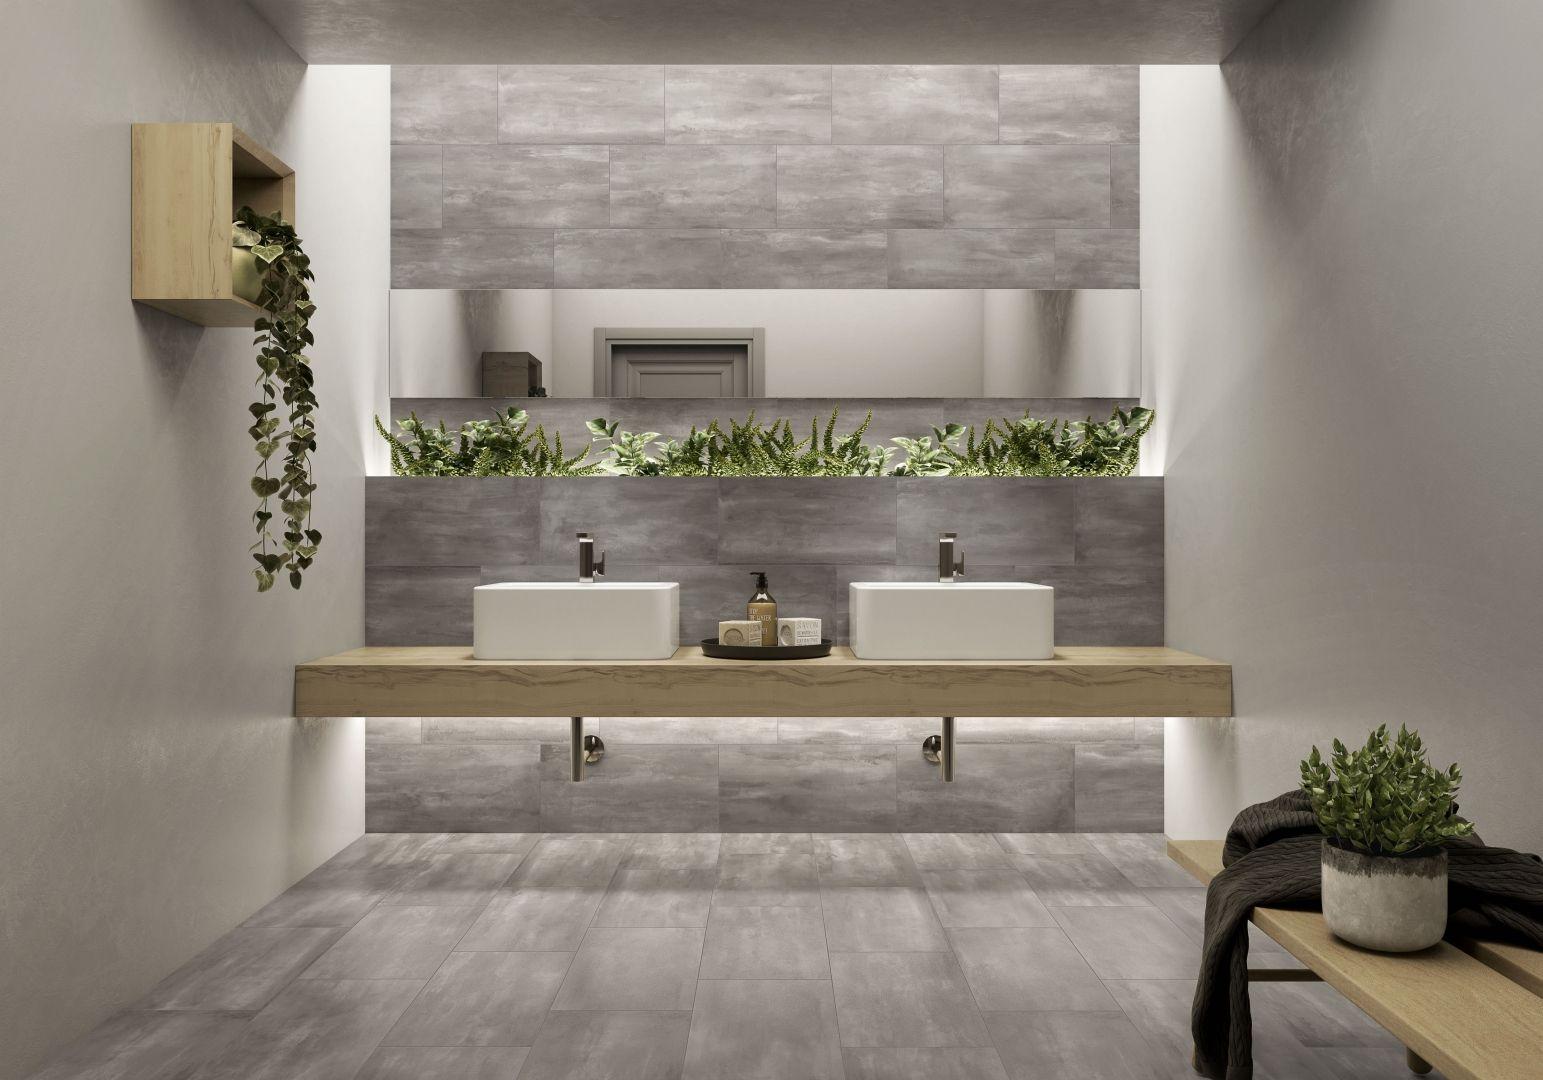 Brickell Tiles Ceramic Wall Roca Tile Usa House Designs Exterior Handmade Tile Backsplash Restroom Design